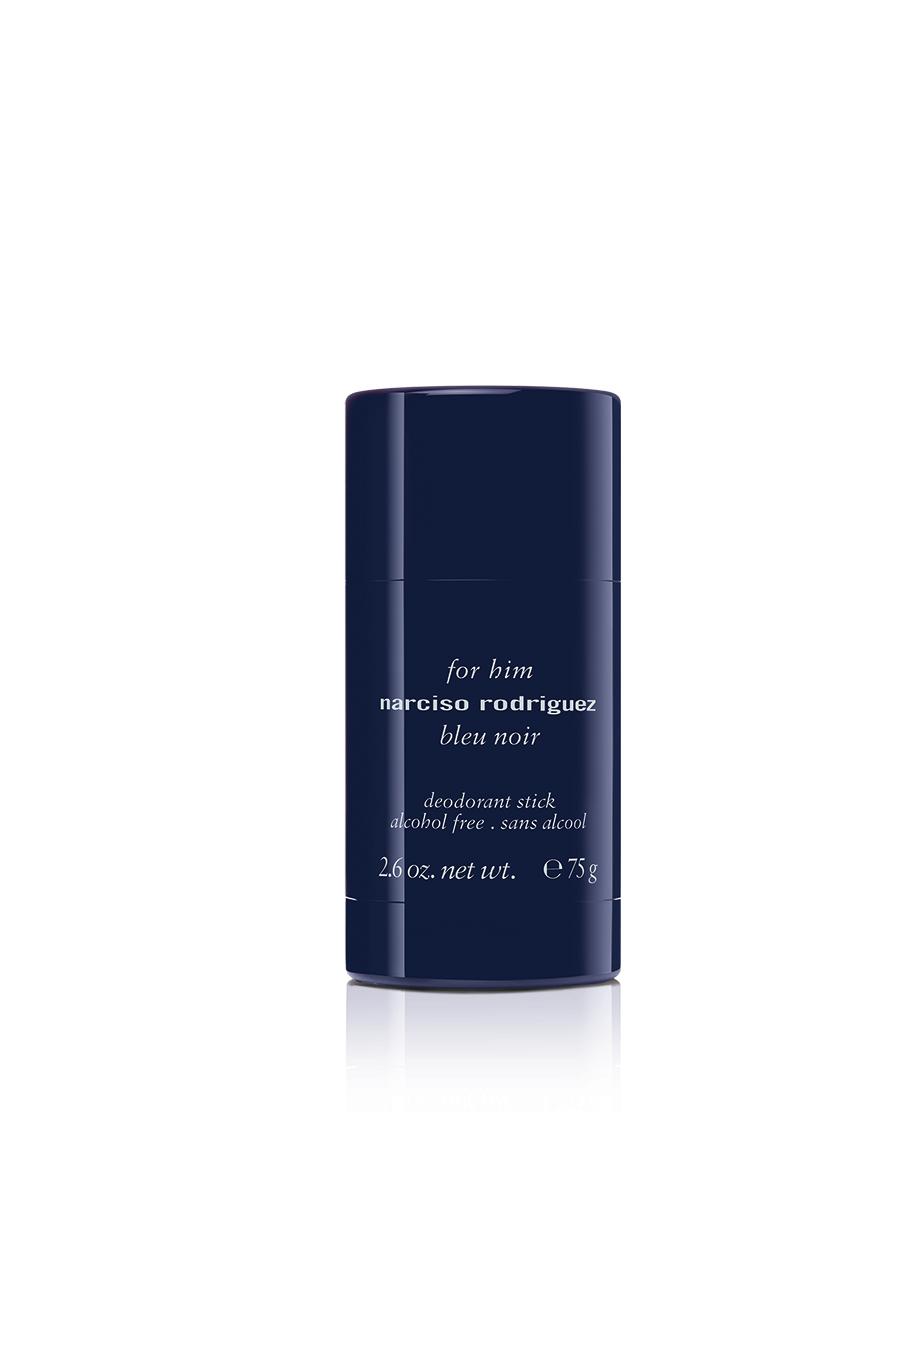 Narciso Rodriguez Bleu Noir For Him Deodorant Stick, 75 g